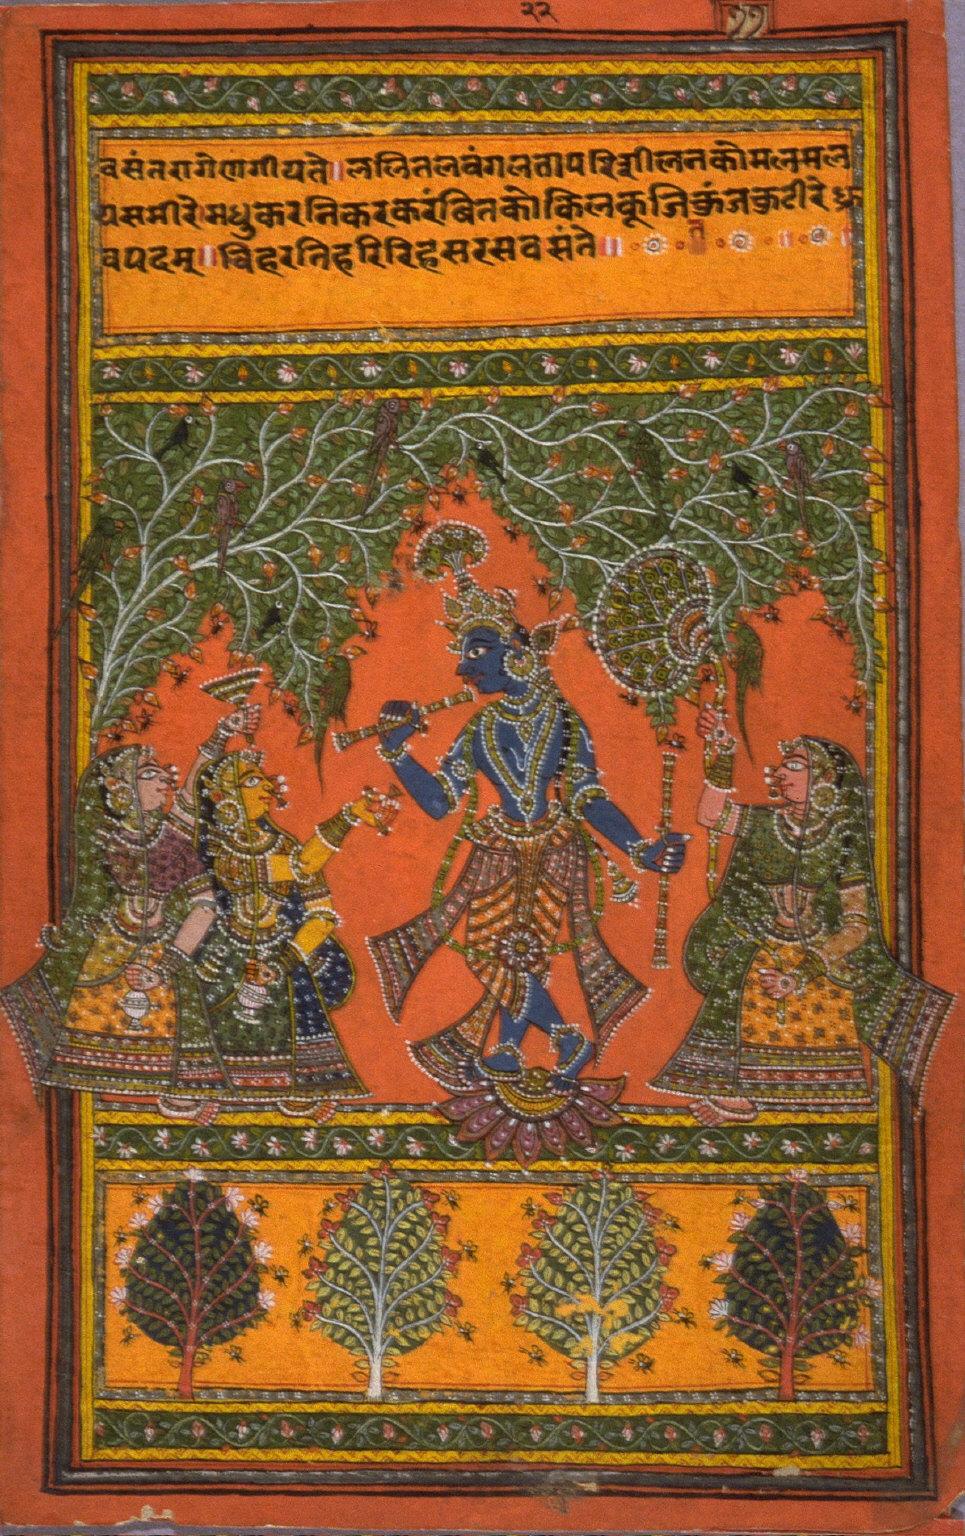 Illustration for Canto 1, verse 27 of Jayadevas Gita Govinda (Love Song of the Dark Lord)